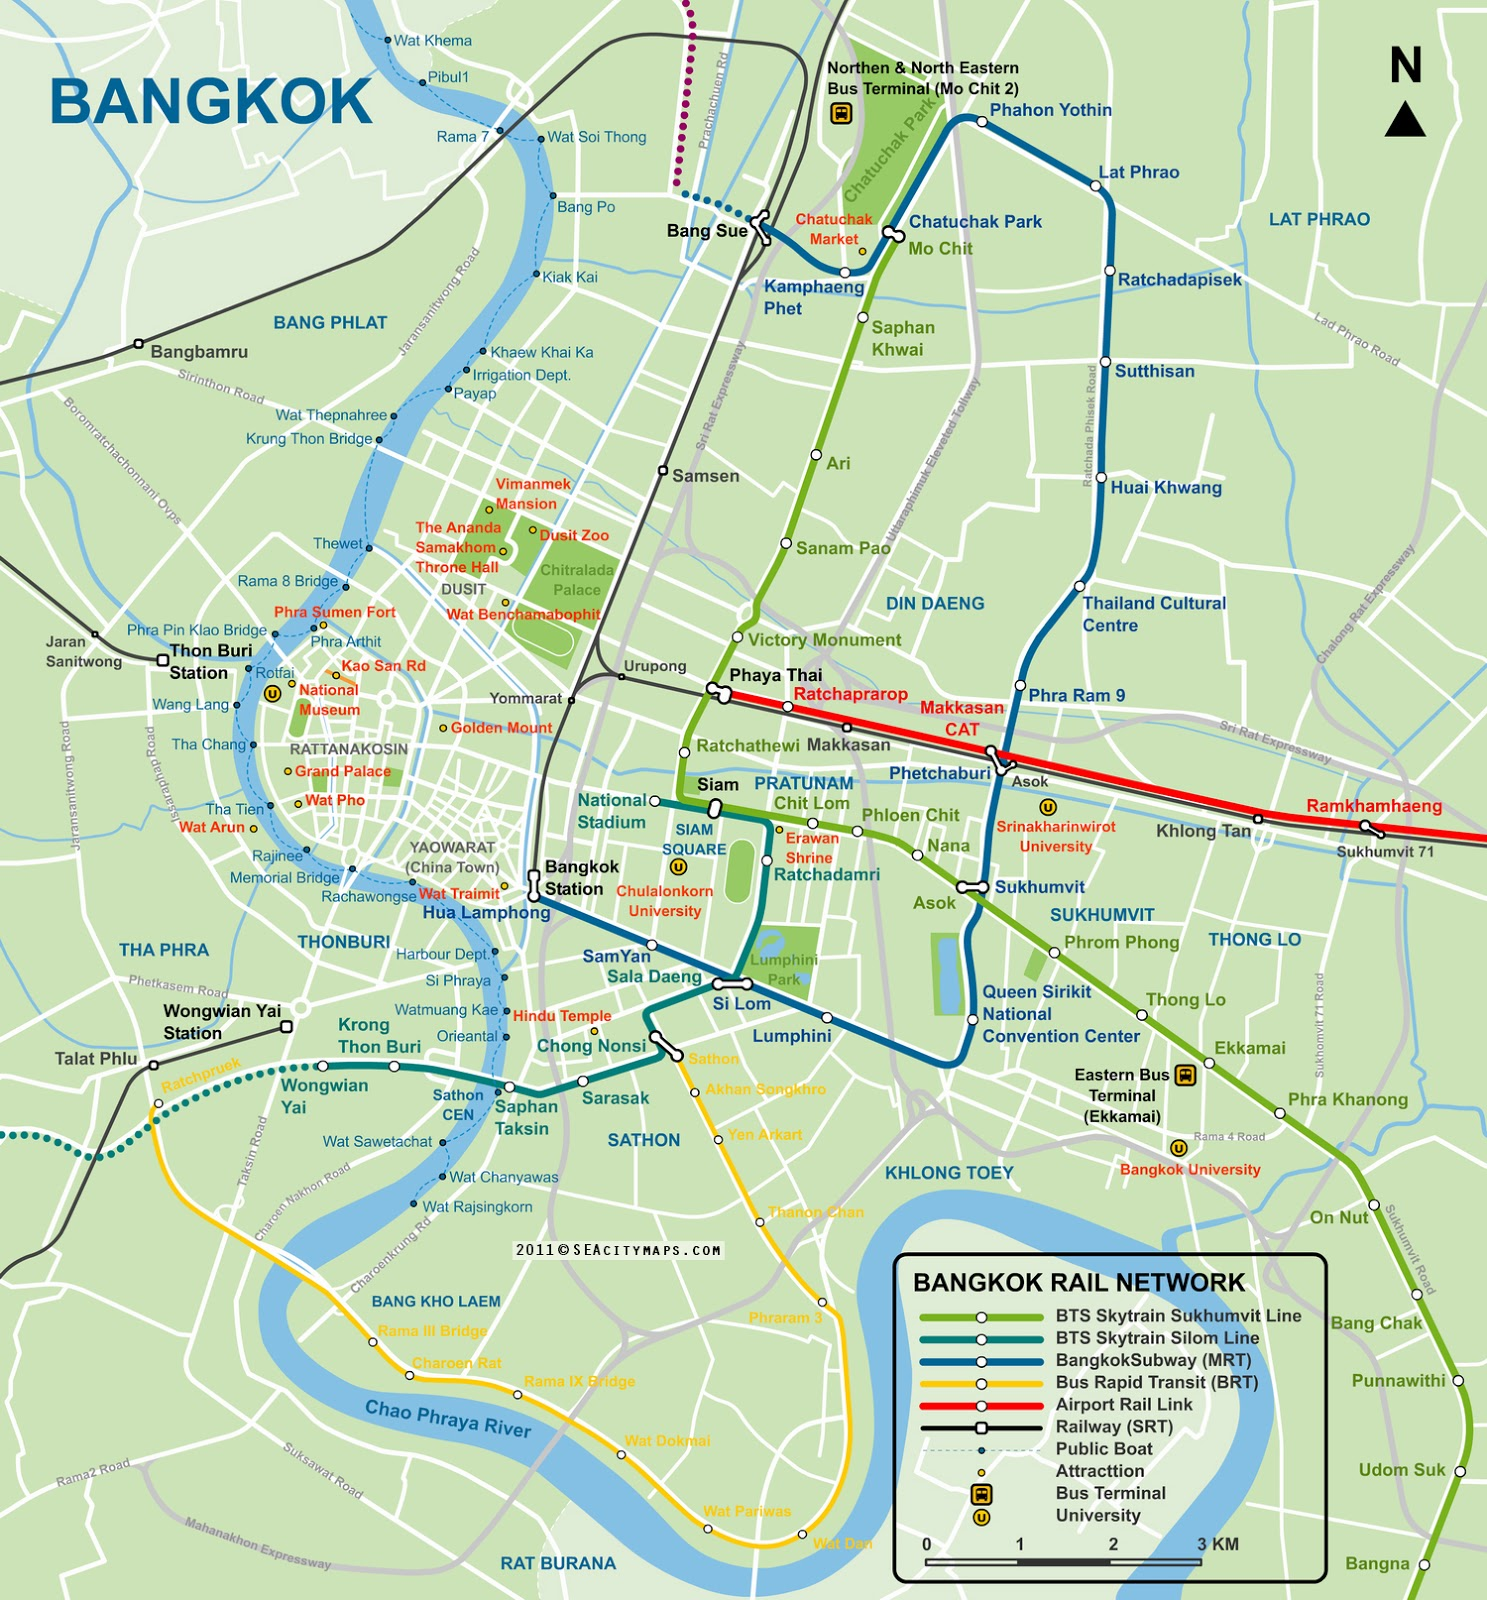 Best travel guide thailand: Travel in Bangkok